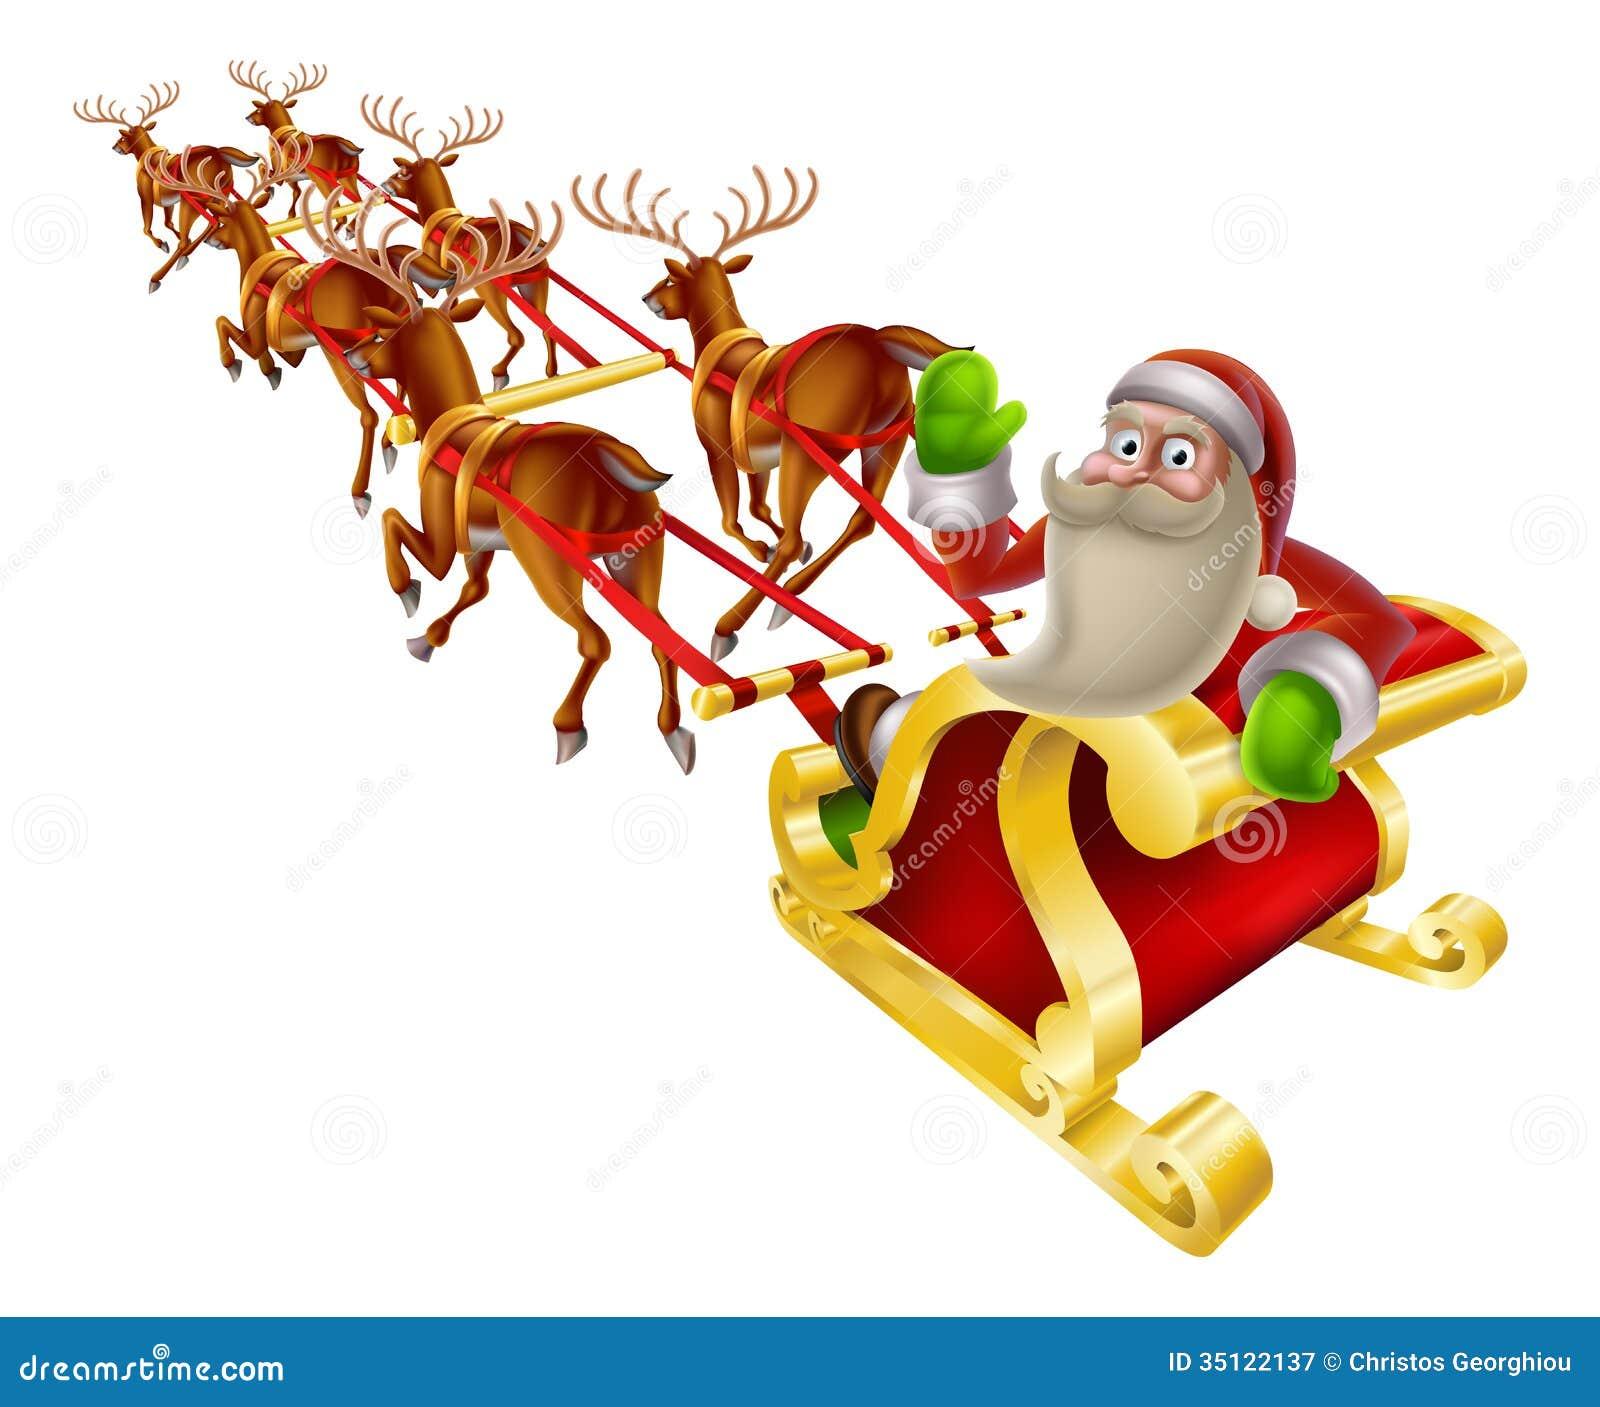 Fantastic Christmas Screensaver Of Santa In Slay Free – Merry Christmas And  SI46